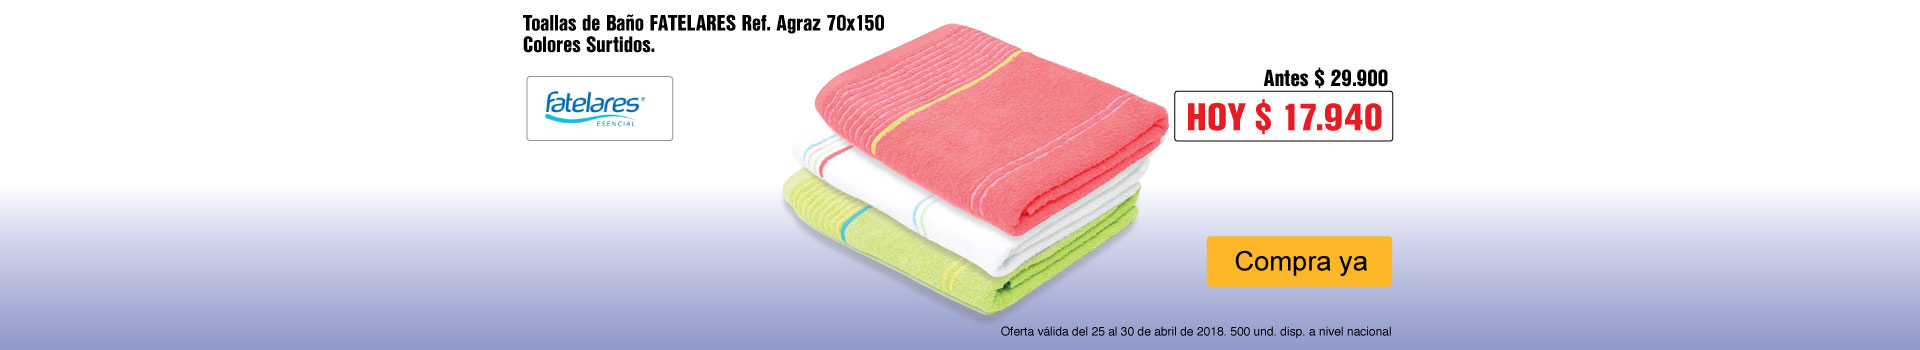 AK-BCAT-2-hogar-PP---Fatelares-toalla-agraz-Abr25